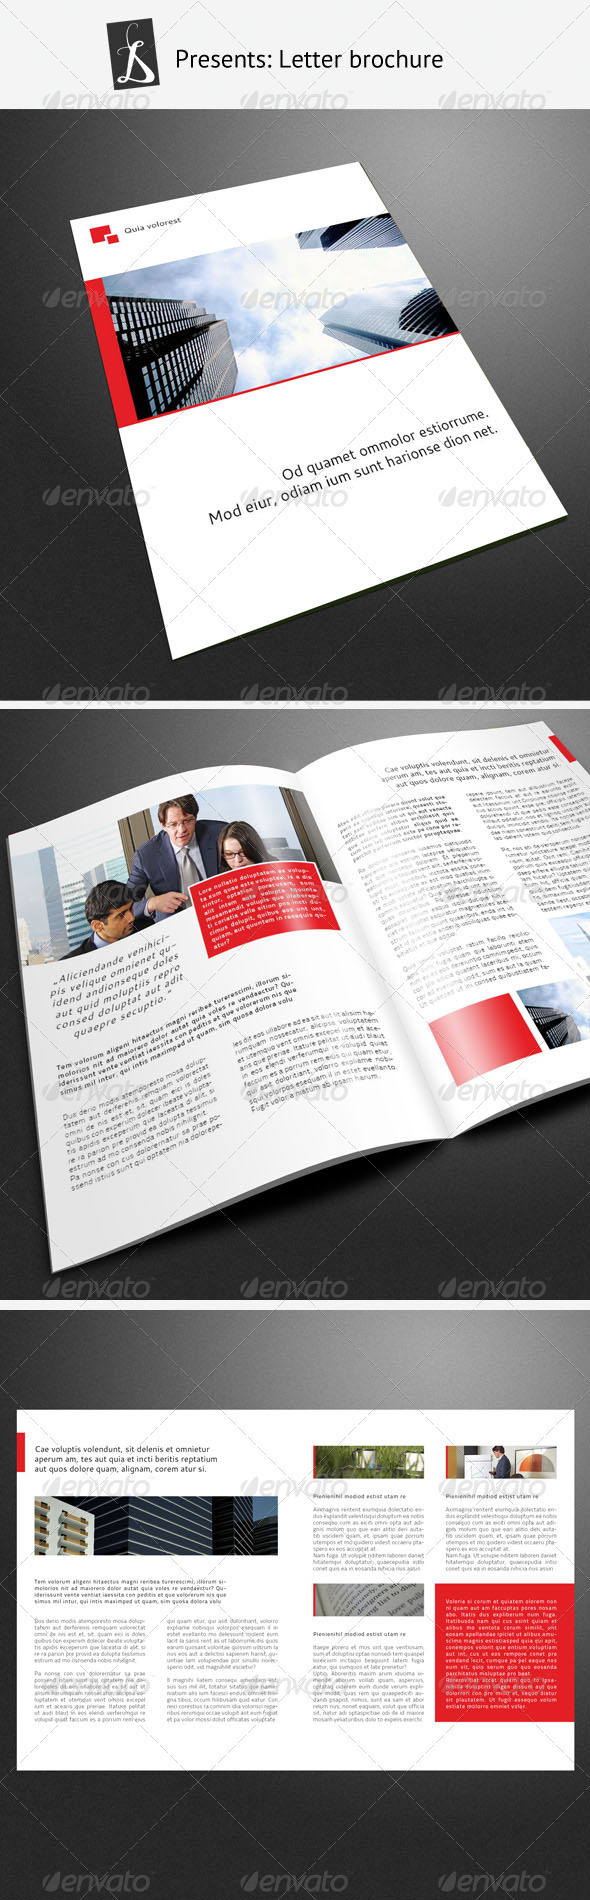 Corporate Brochure 7